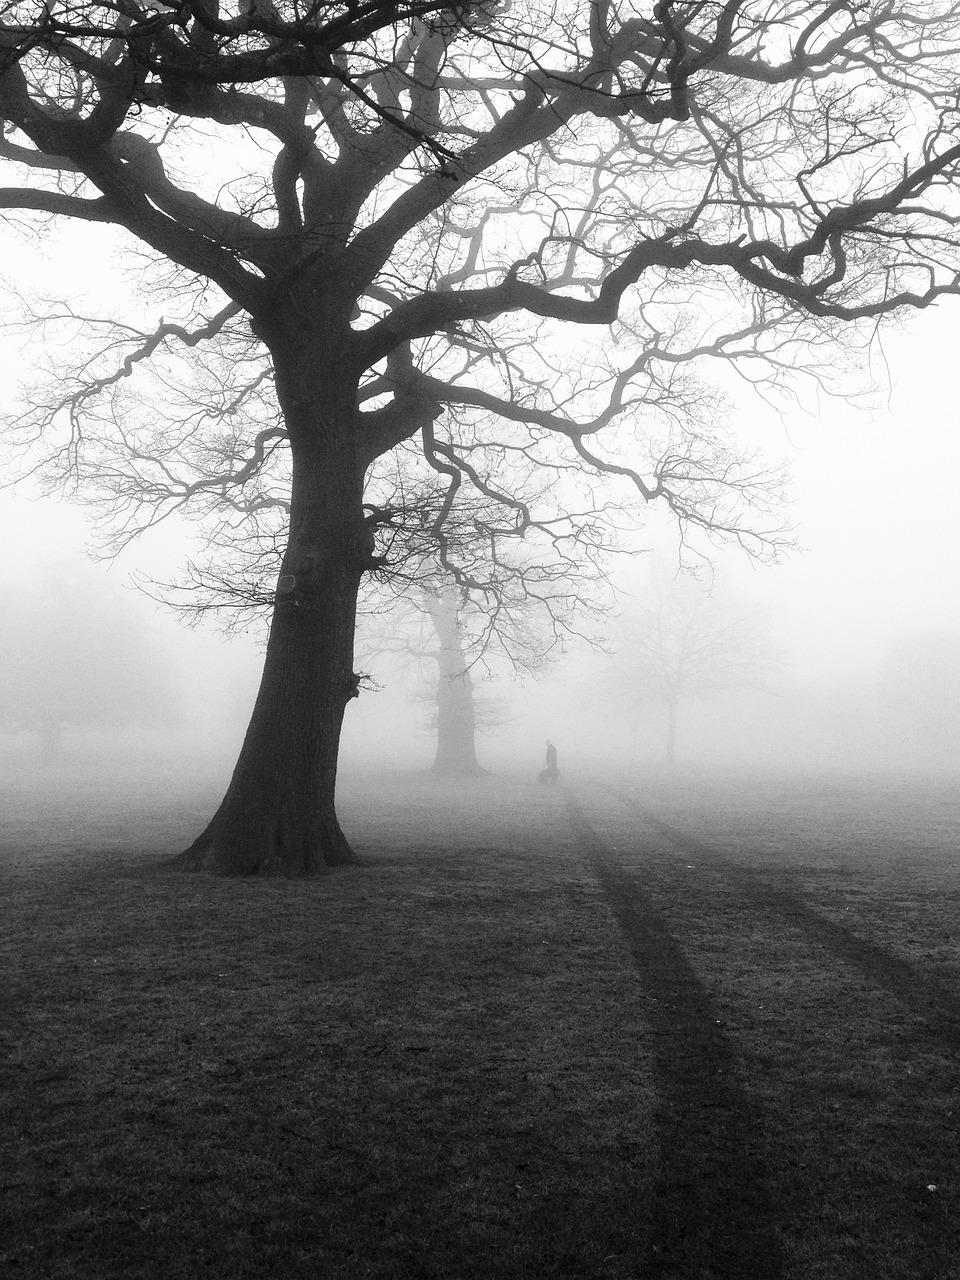 https://pixabay.com/en/trees-mist-fog-eerie-nature-450854/